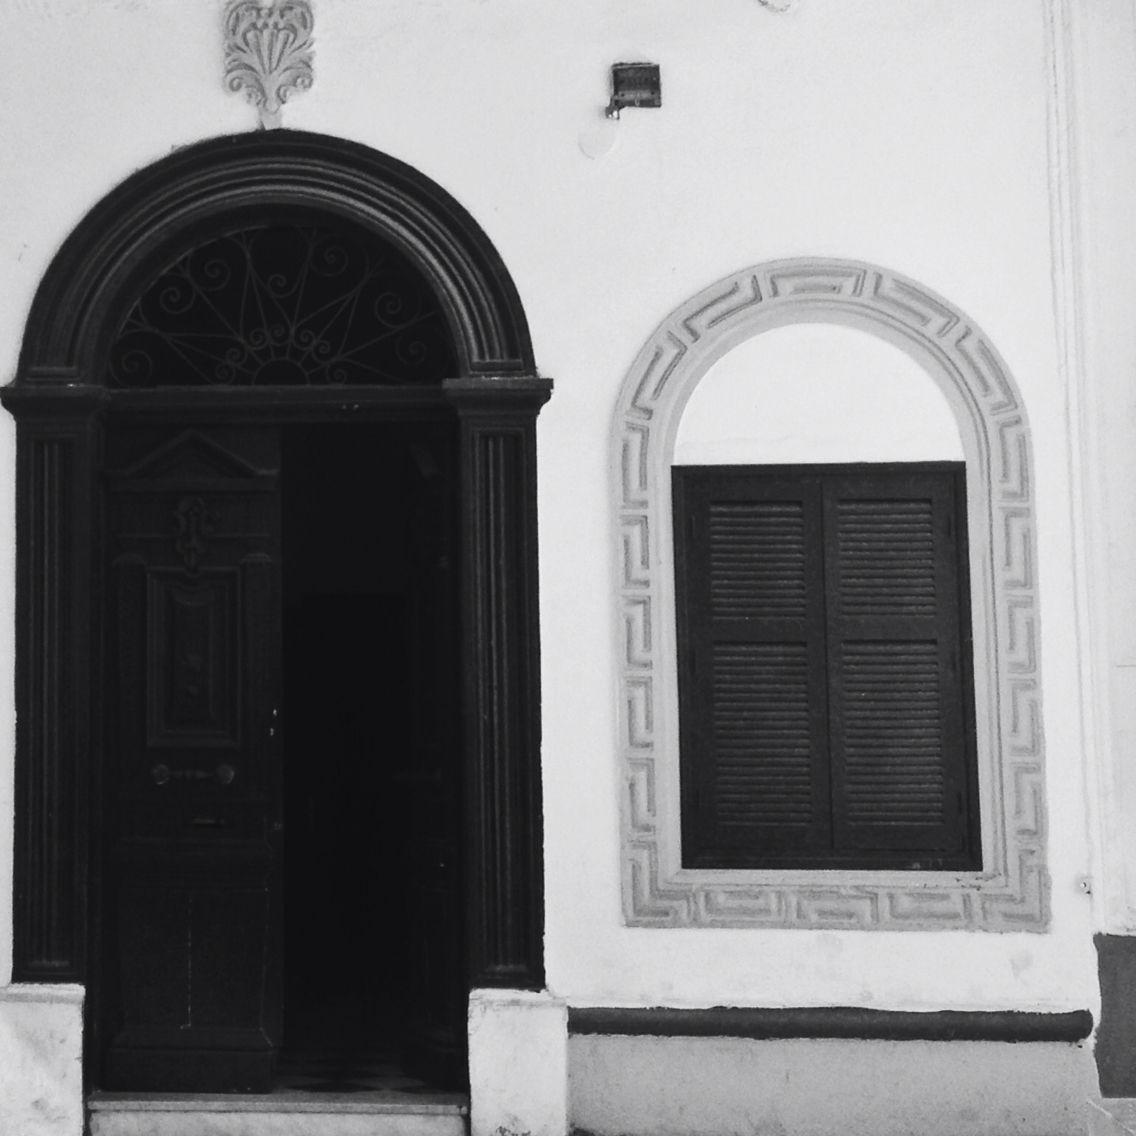 #BLACK #WHITE #iphonephotography #vscogrids #vscogood #vscocam #vsco #vscodaily #vsconature#bird #cigone#vscodaily #vscocam #instagood#huntgram#iphone5 #iphone #iphoneonly #africa #everydayafrica#photooftheday#street #sky#shot #justgotshot#morocco #vscomorocco #thecreatorclass #minimalist #streemag #explorers #iphonephoto #iphonephotography